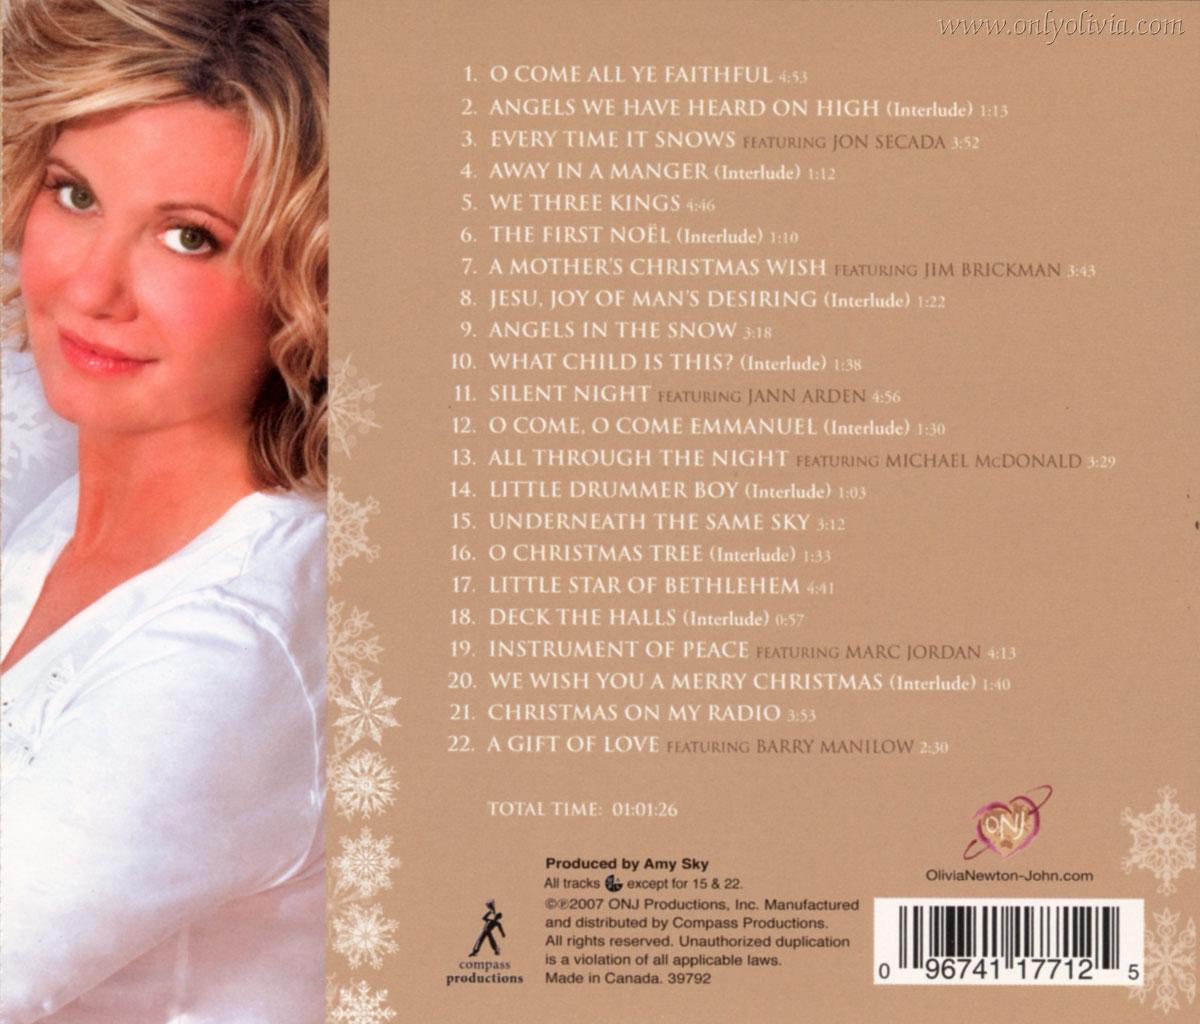 Olivia Newton-John -> music -> albums -> Christmas albums -> A ...